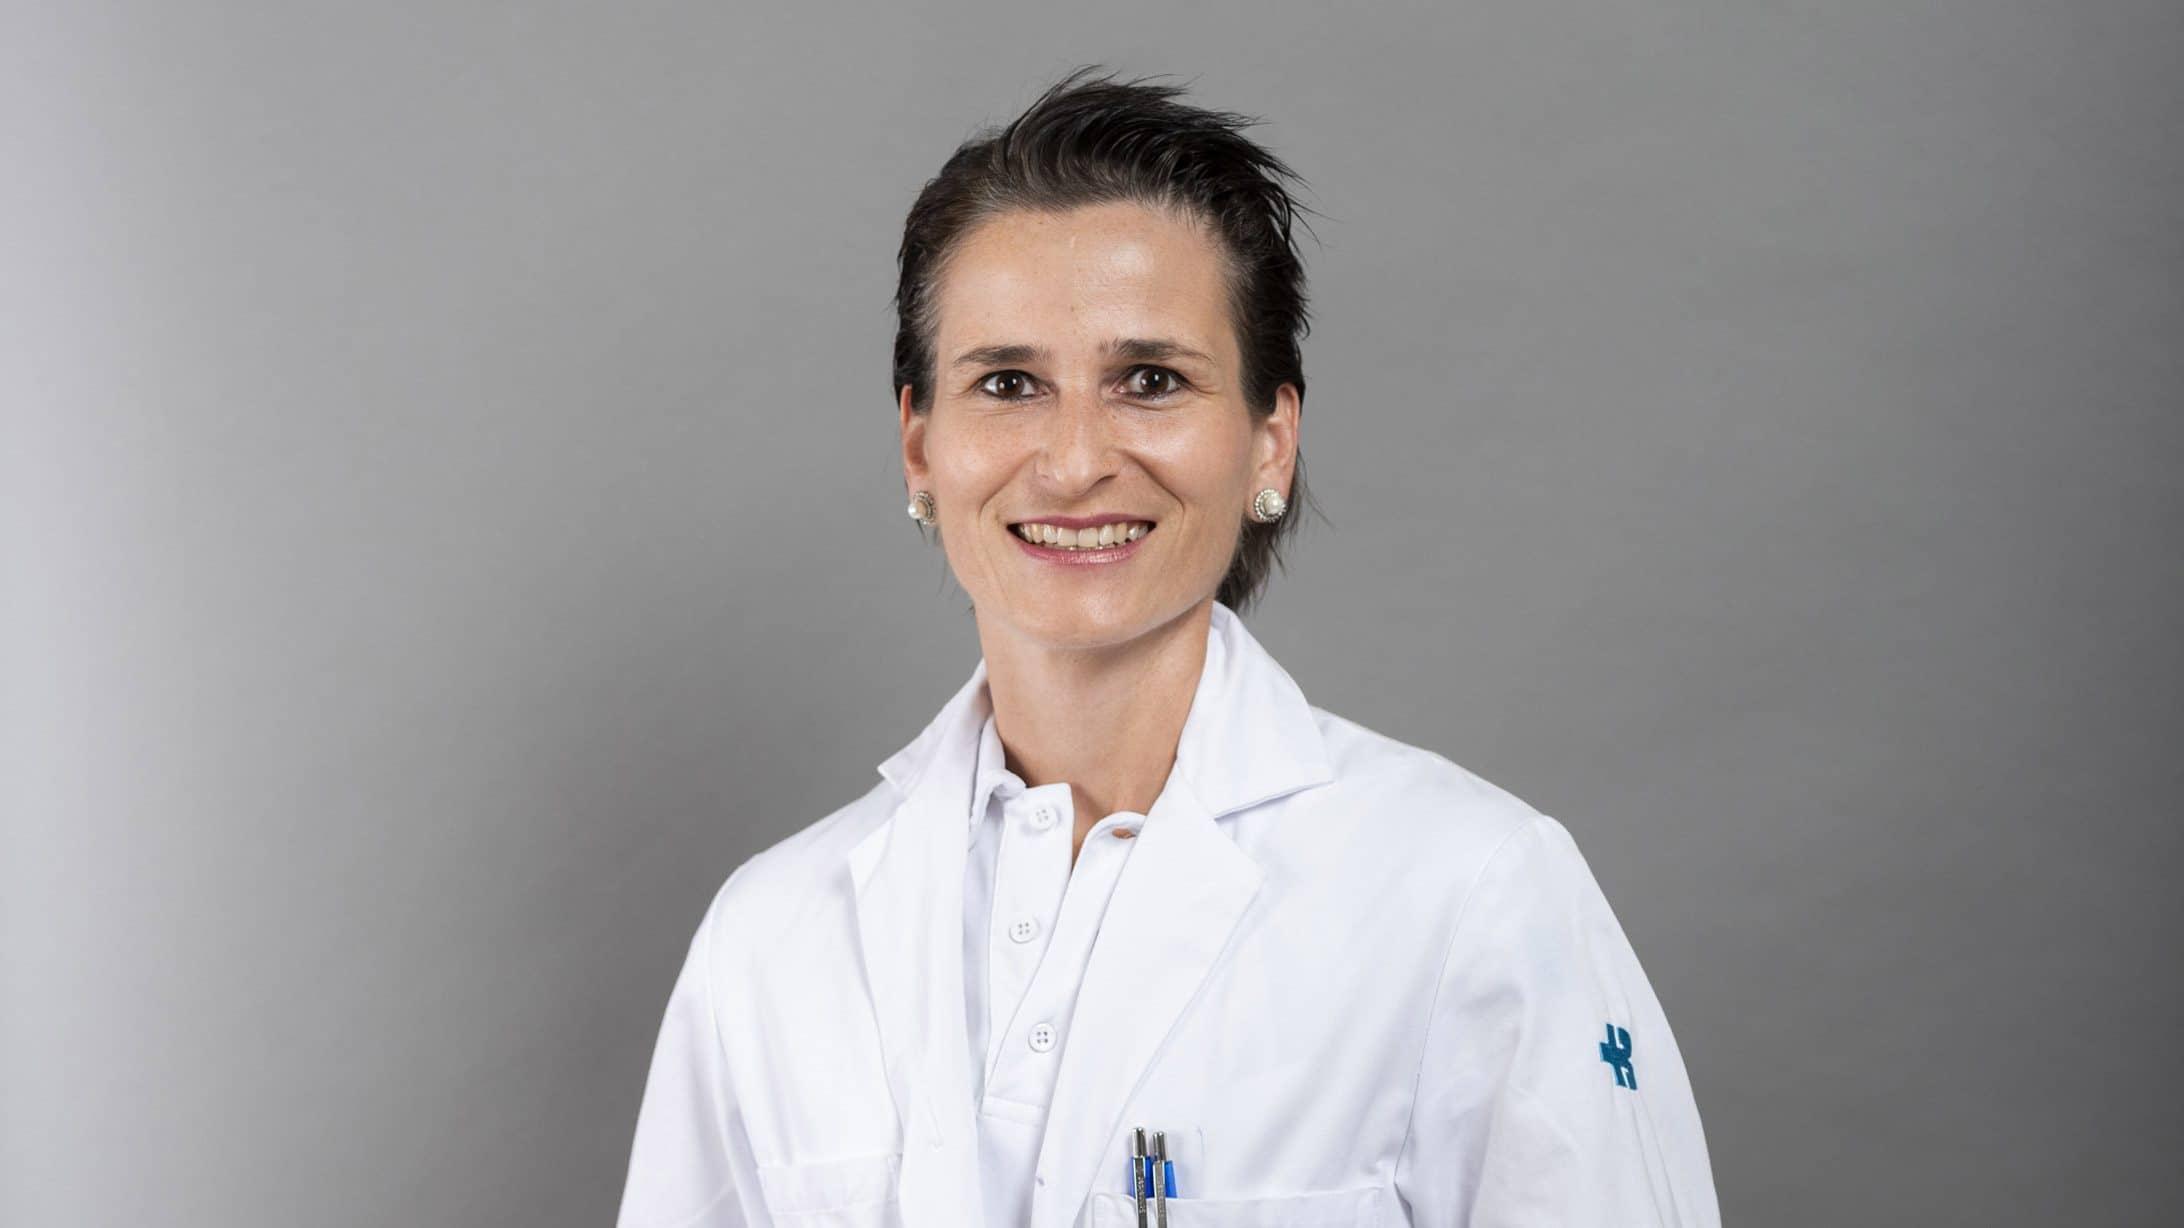 Angélique Sponholz-Schudel, Gastroenterologin am KSB